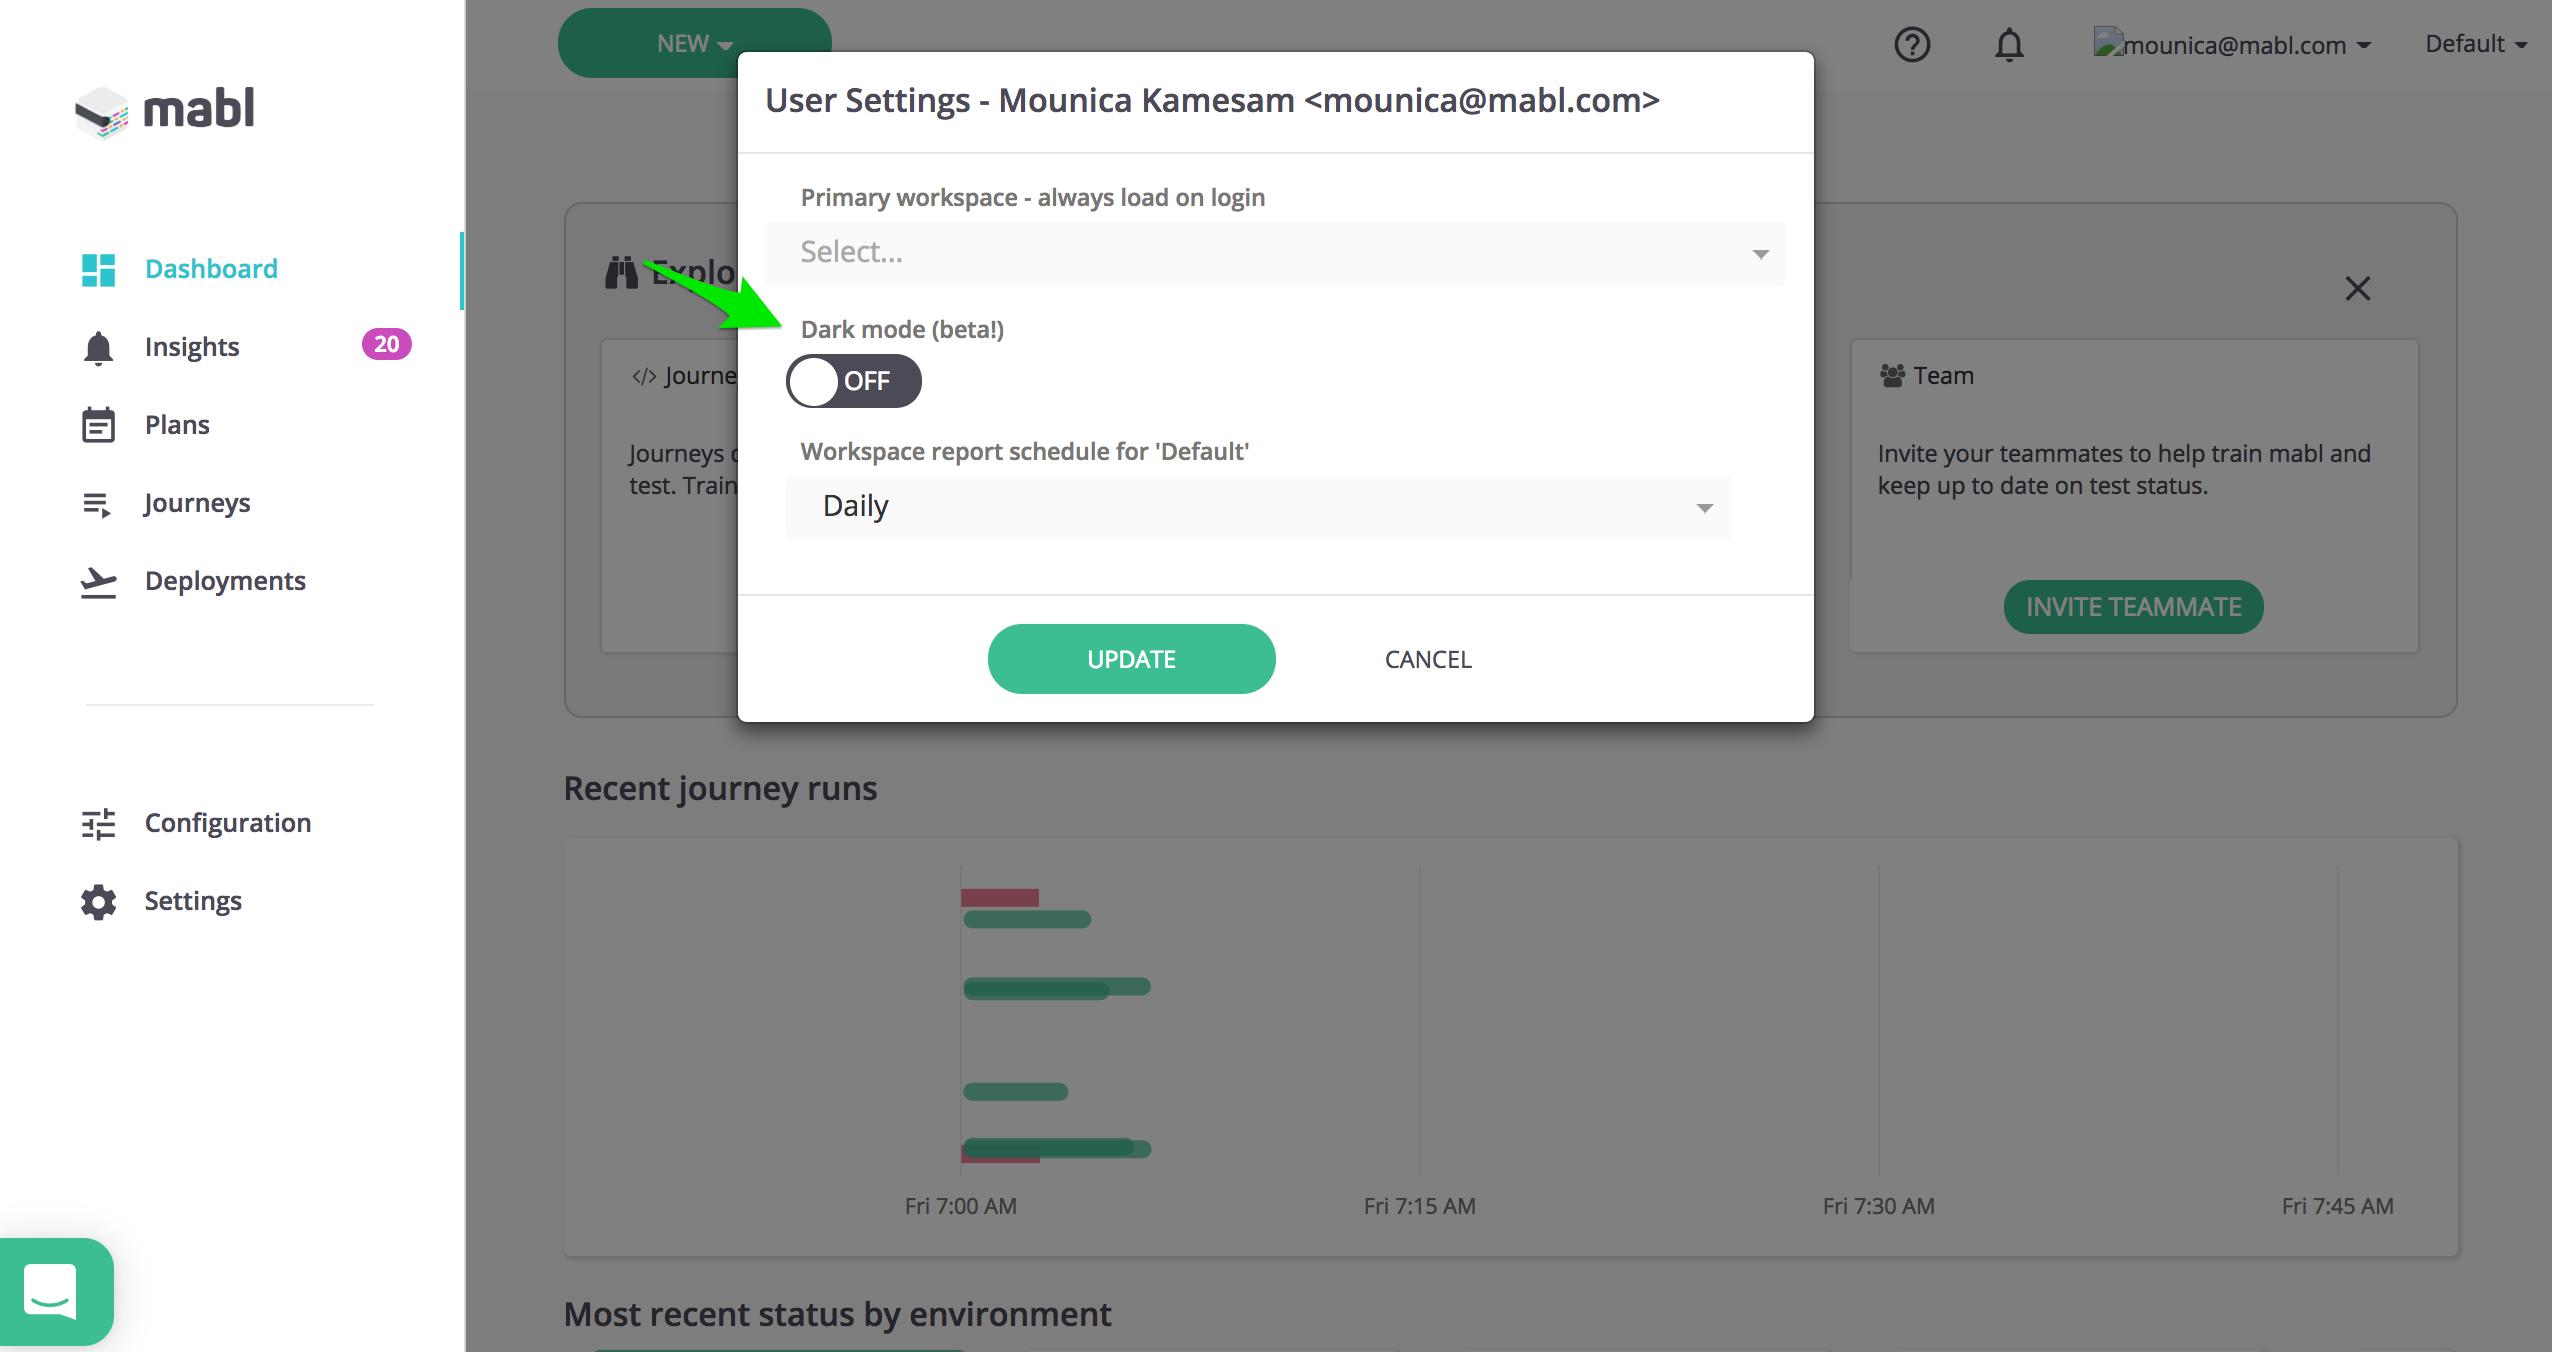 User Settings --> Dark Mode